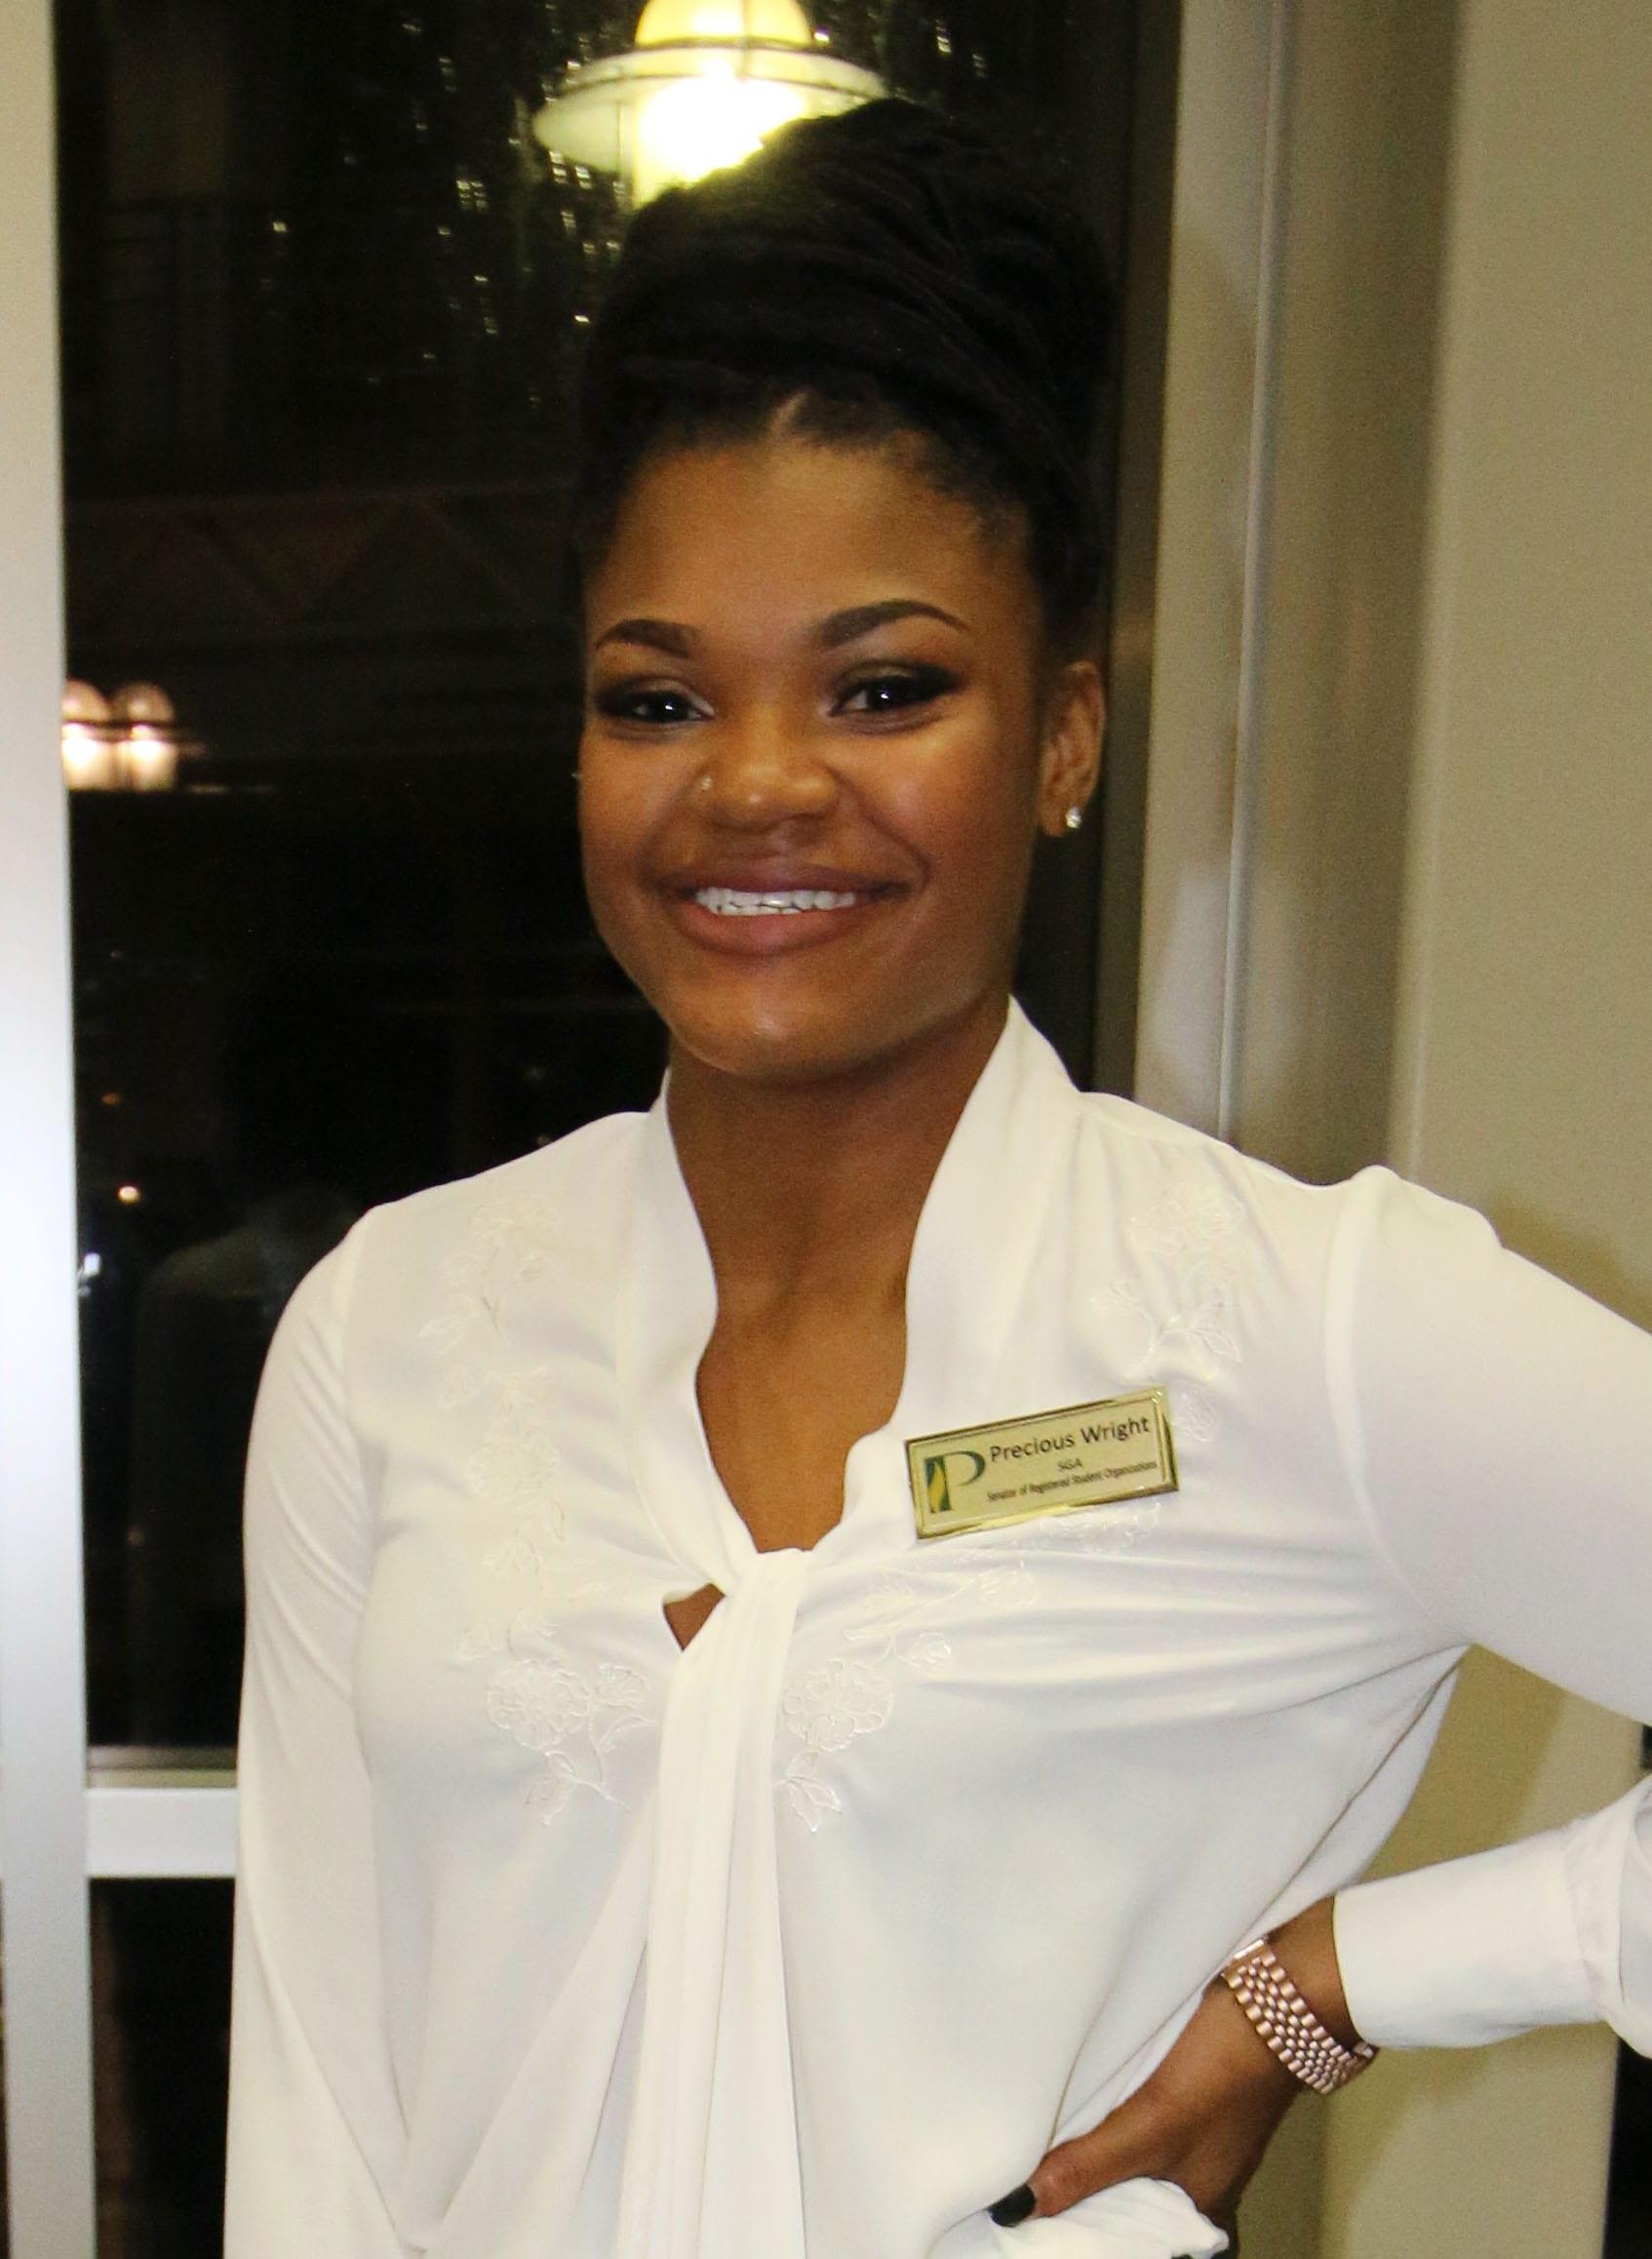 Precious Wright, SGA President